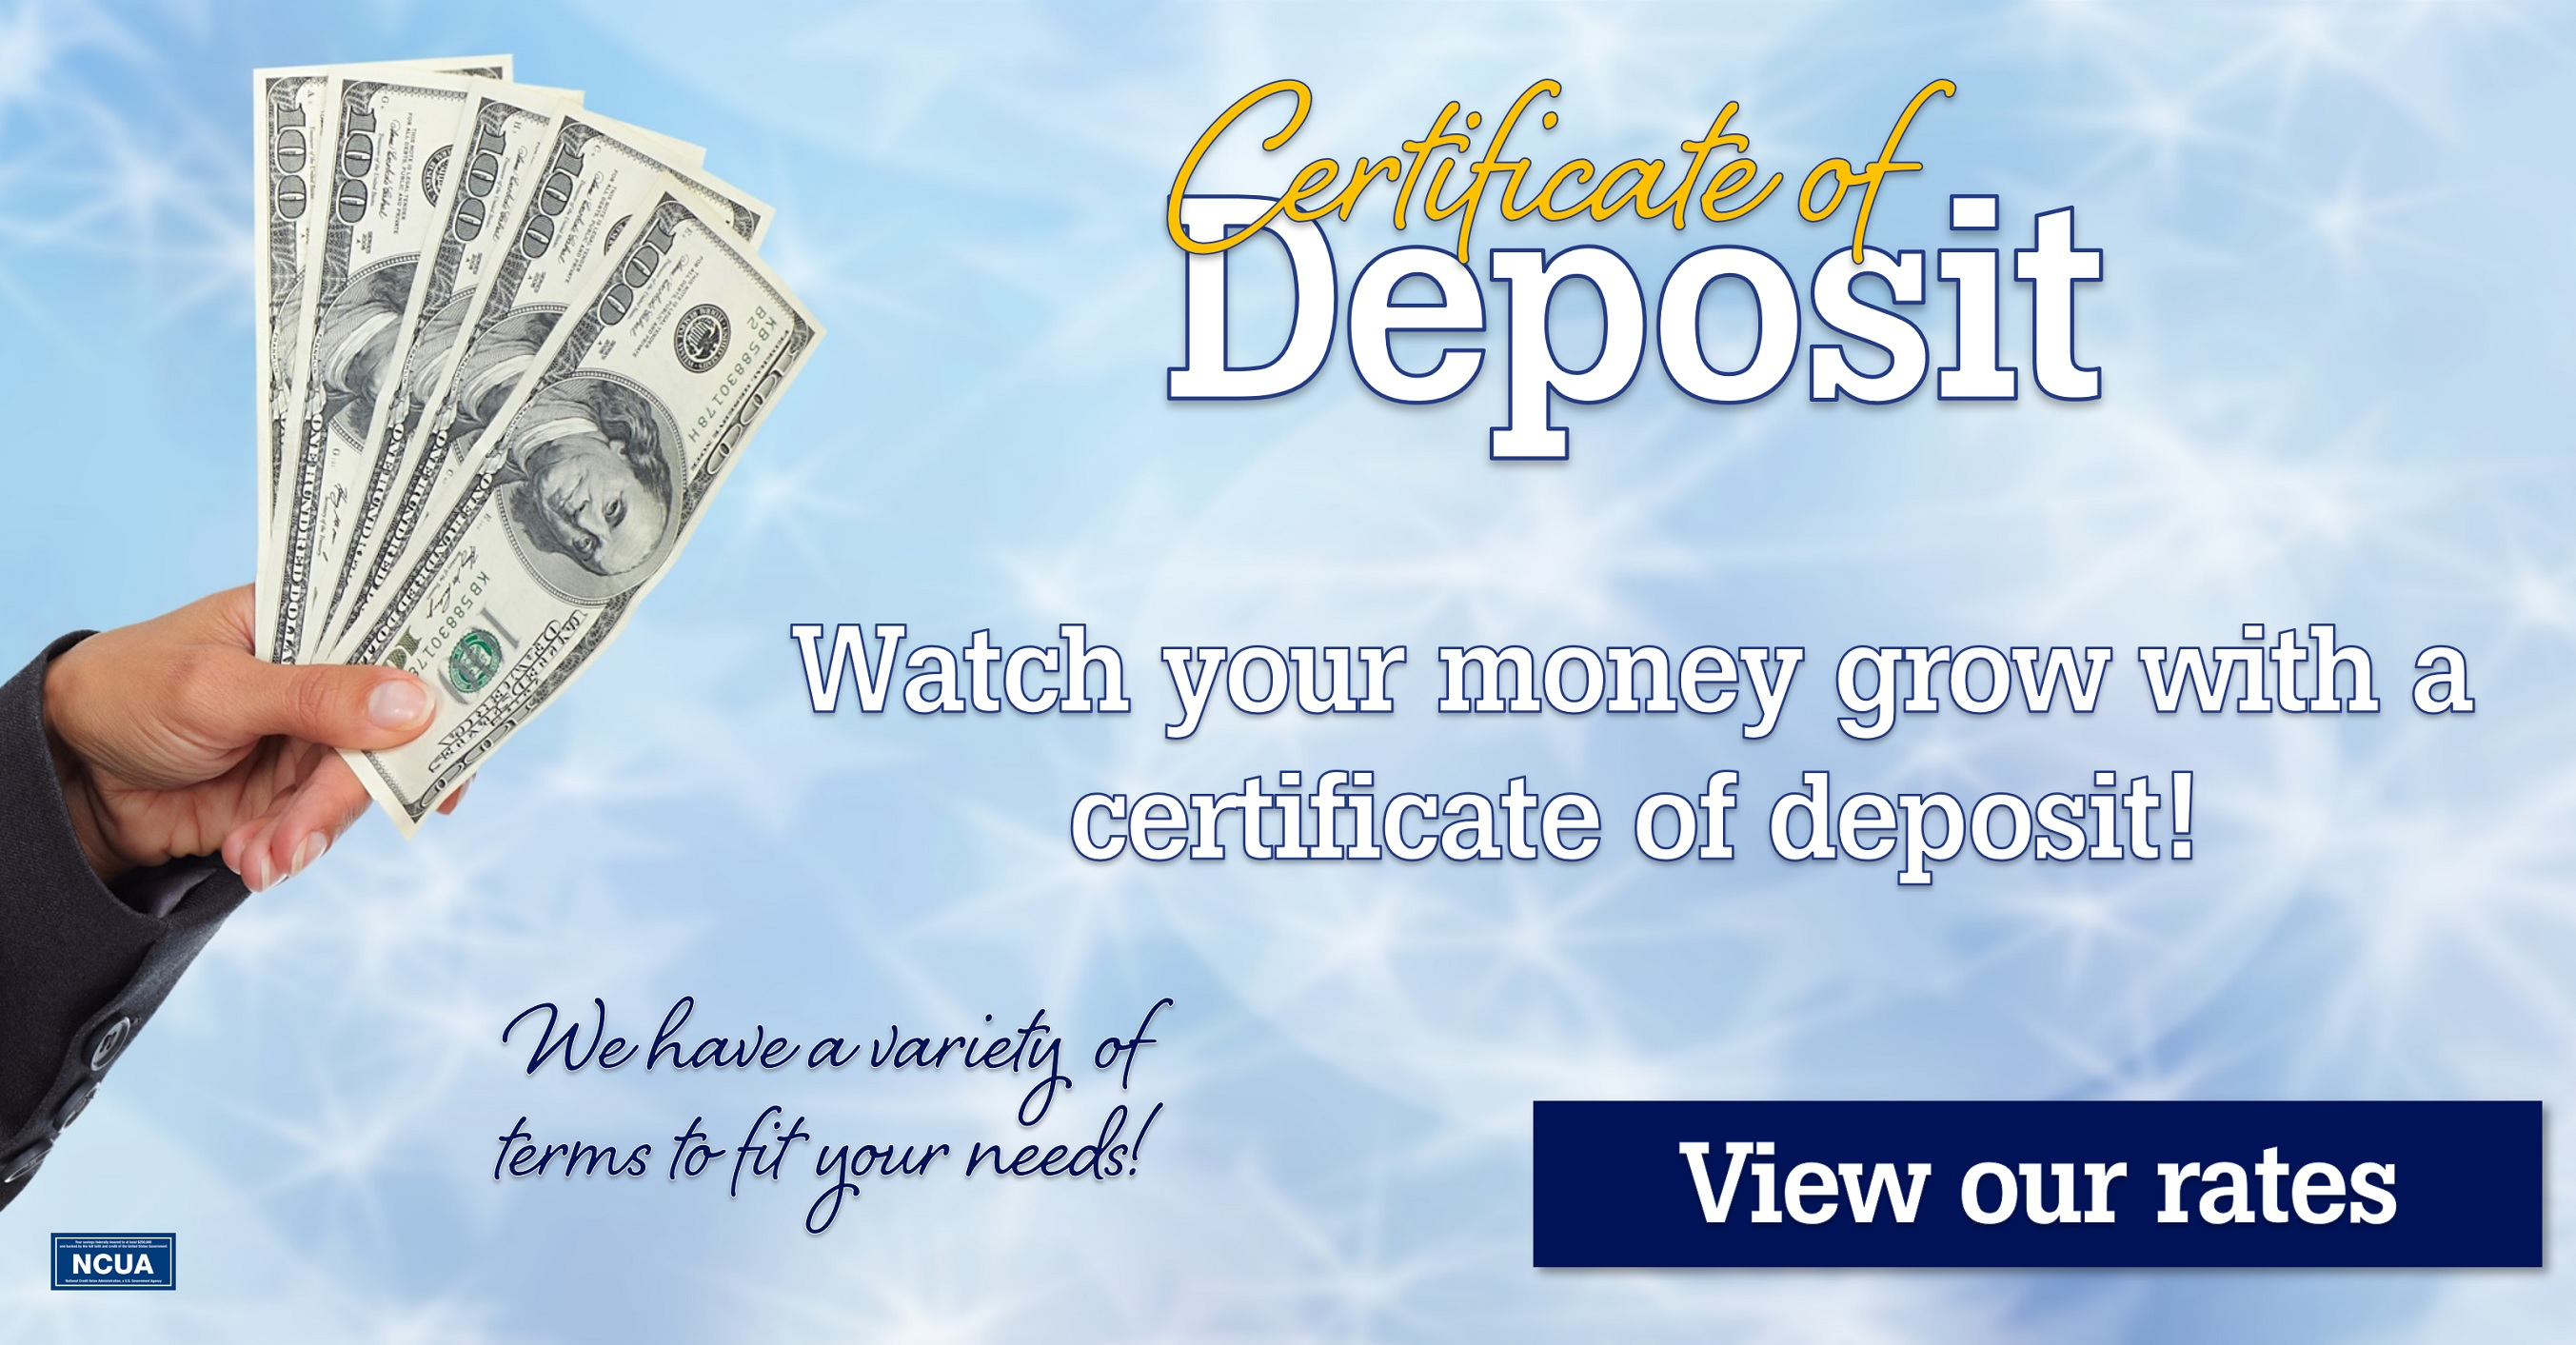 Certficate-of-Deposit-2